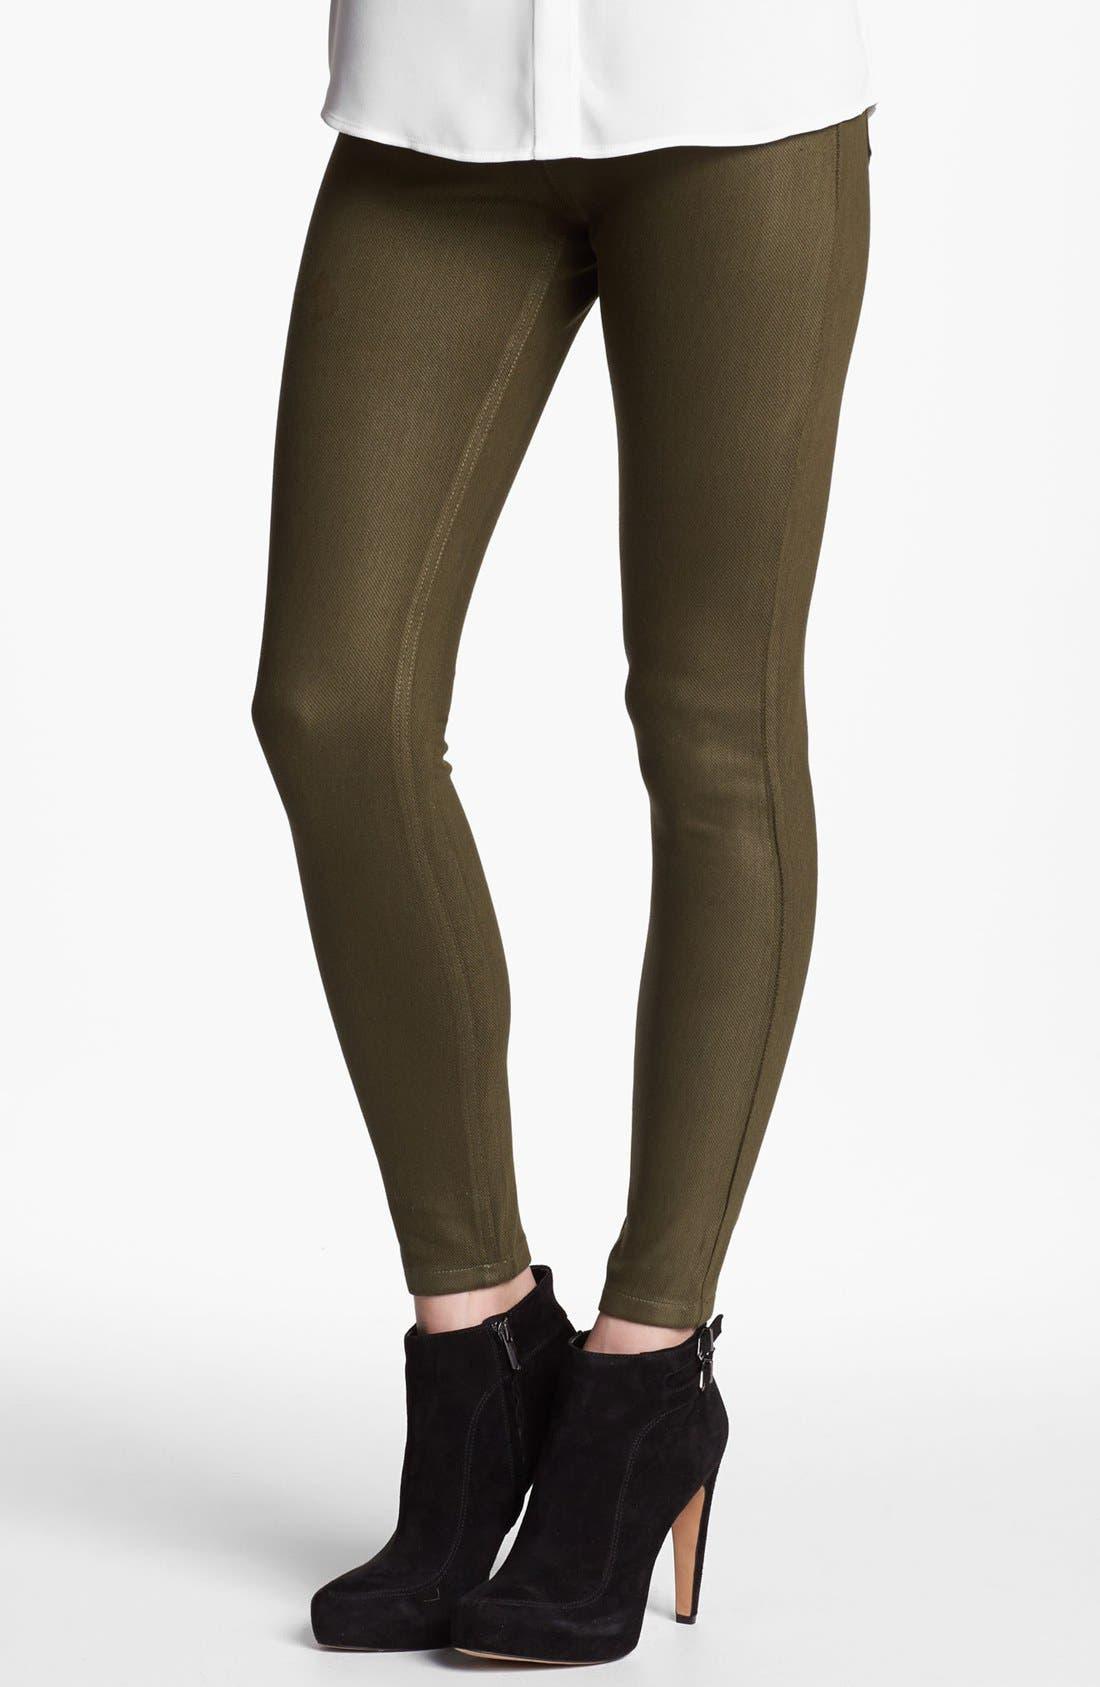 Alternate Image 1 Selected - Hue Waxed Denim Leggings (Online Only)